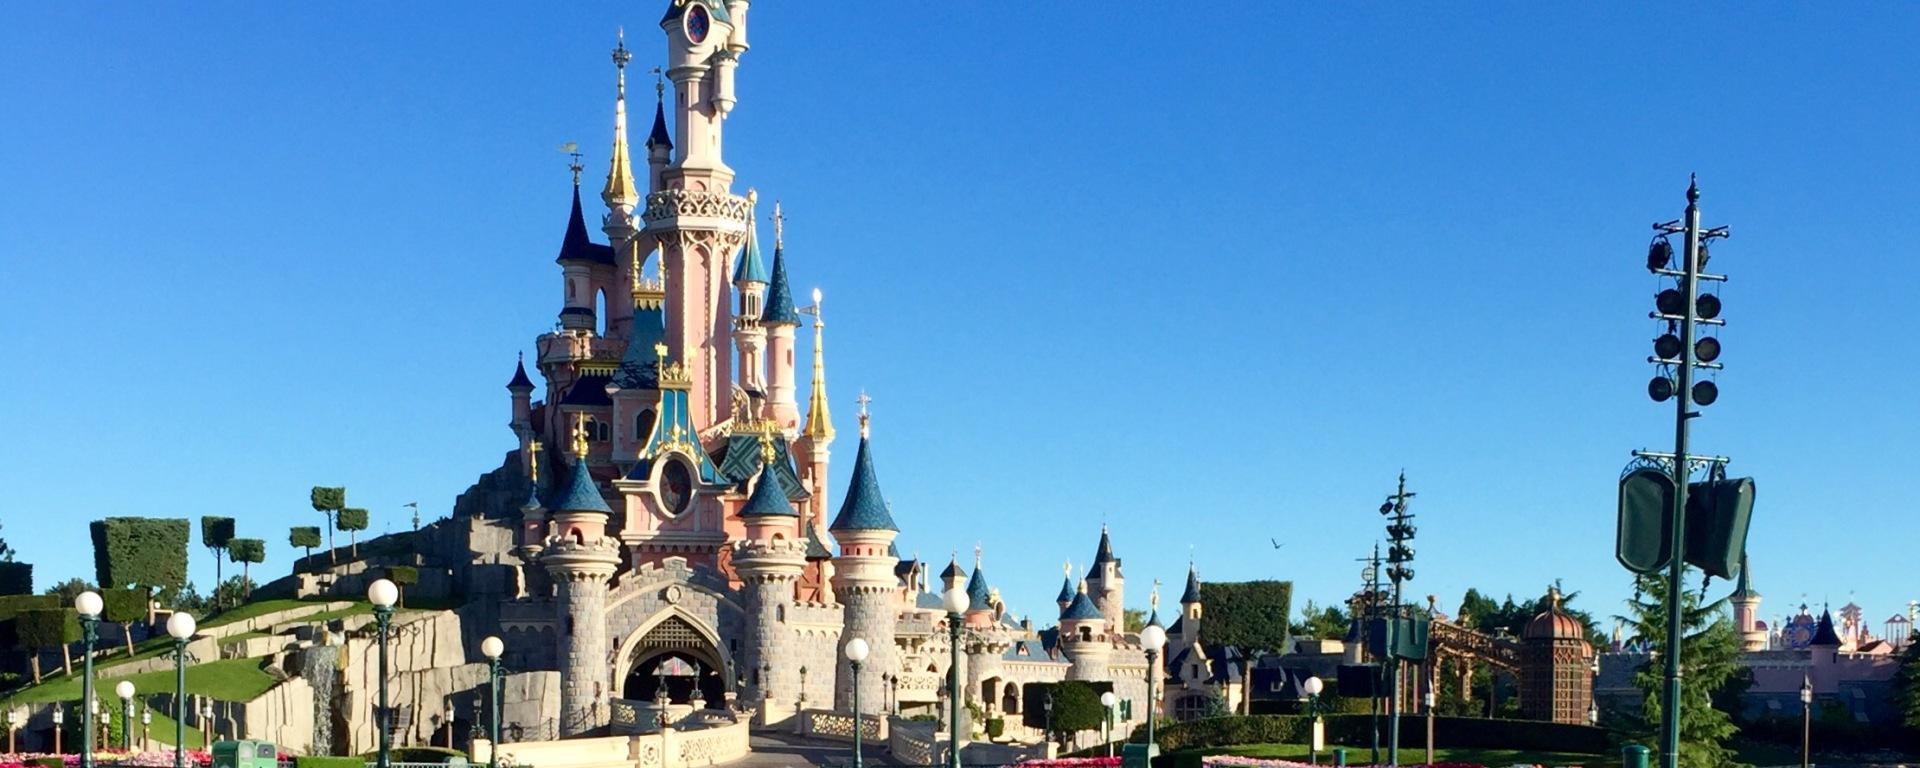 Travailler à Disneyland Paris Call Me Lou